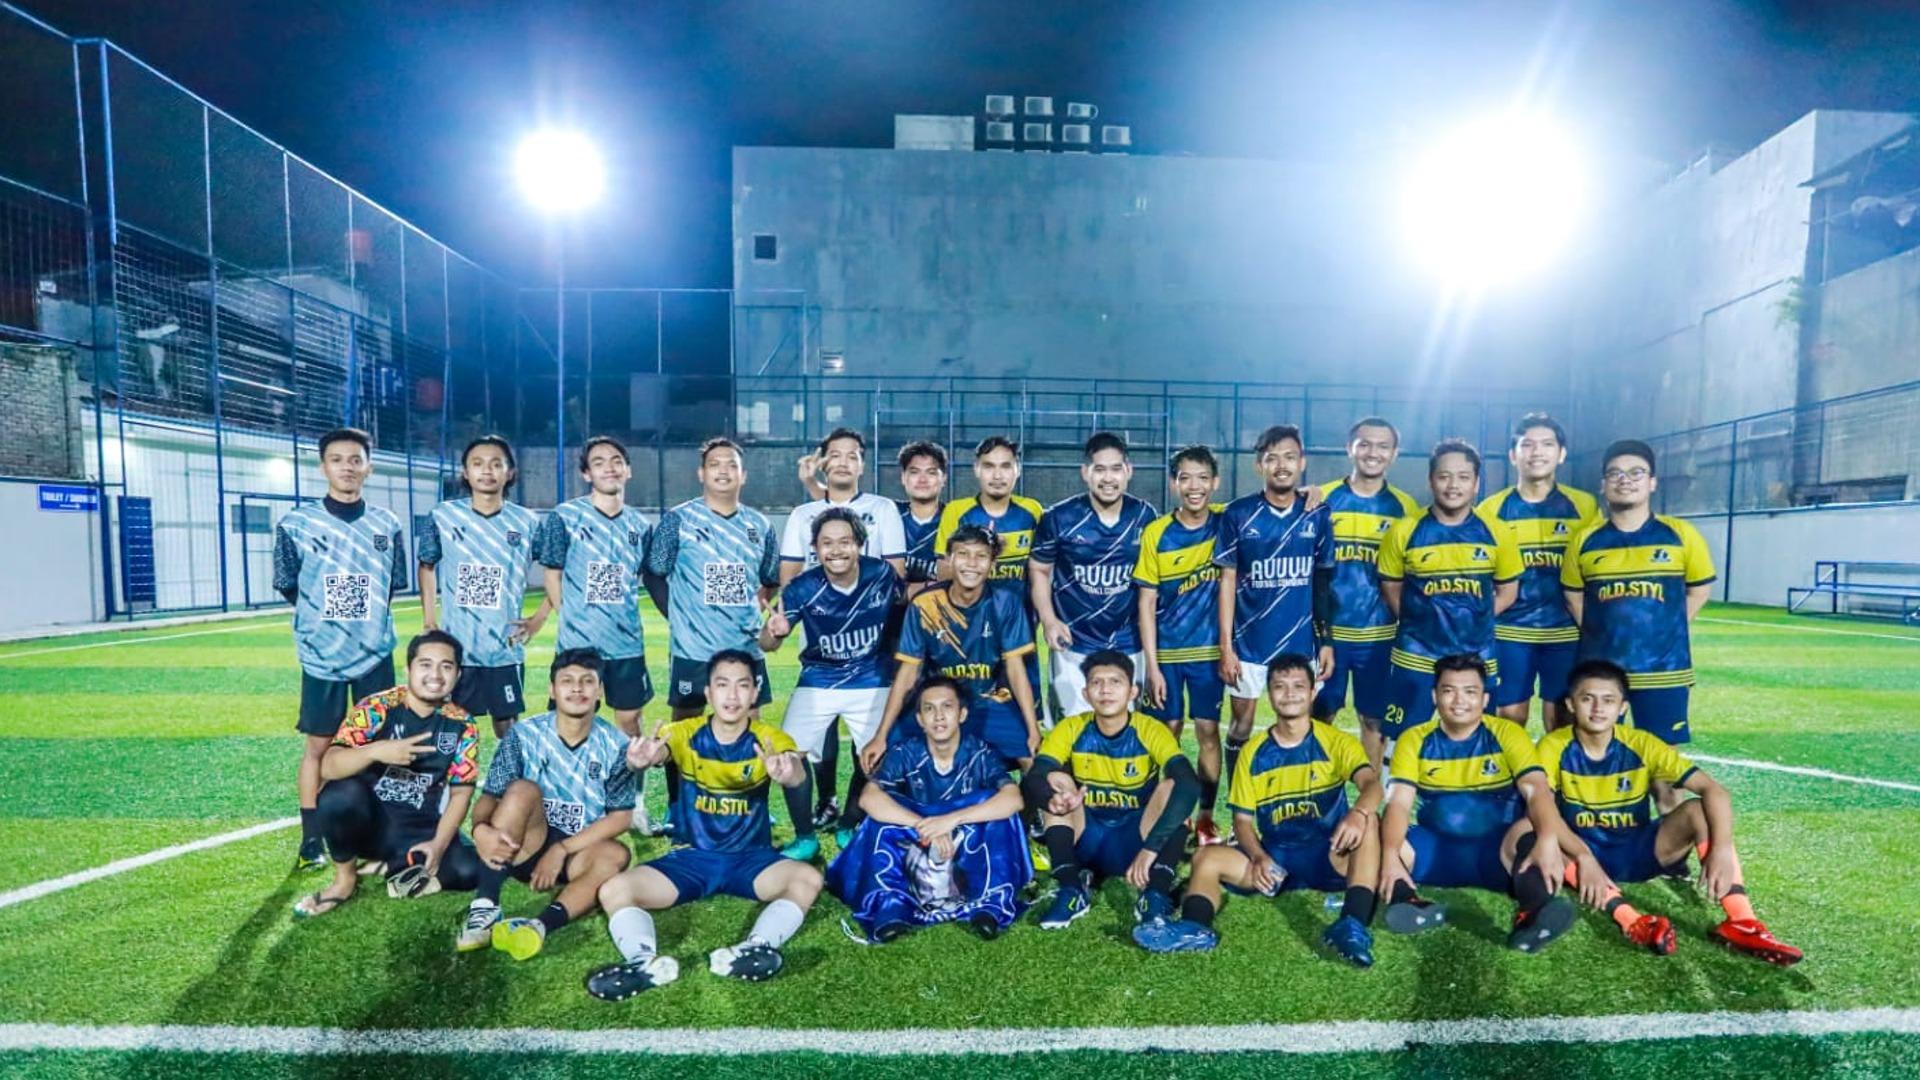 SUNDAY FUN FOOTBALL at SERENIA